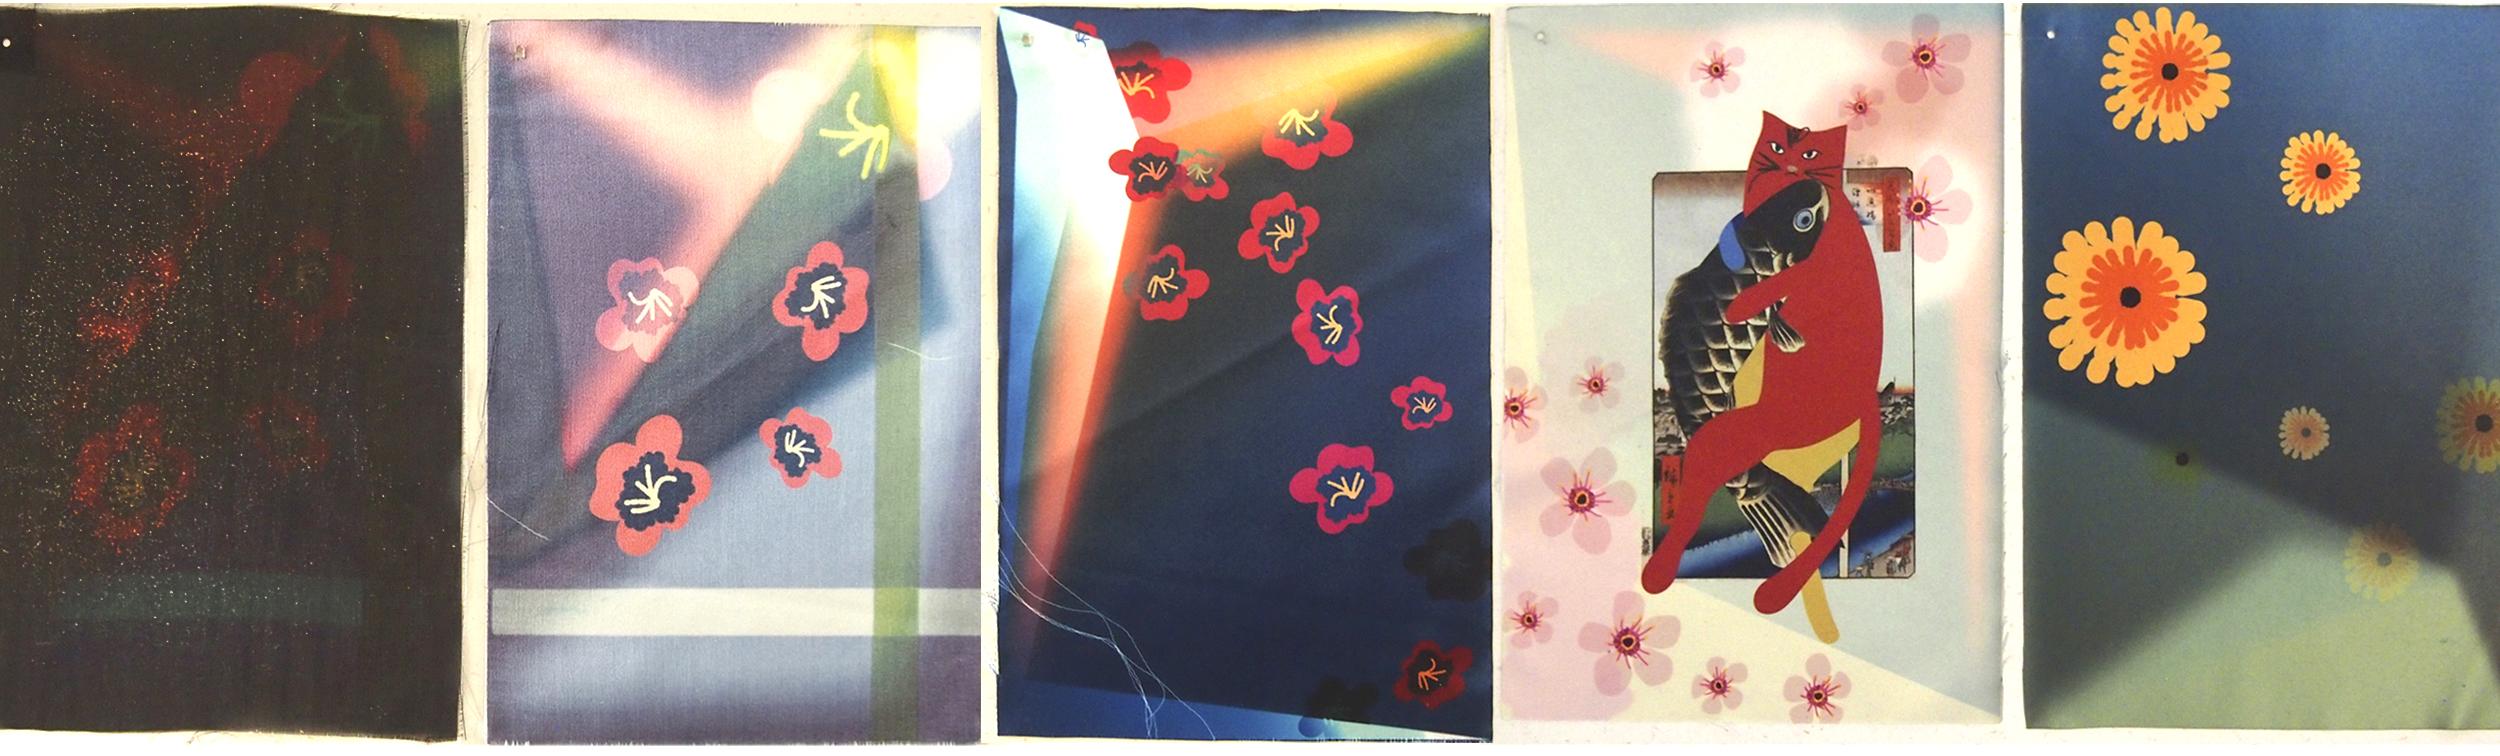 gallery-portfolio-finalfantasy7-samples-banner.jpg